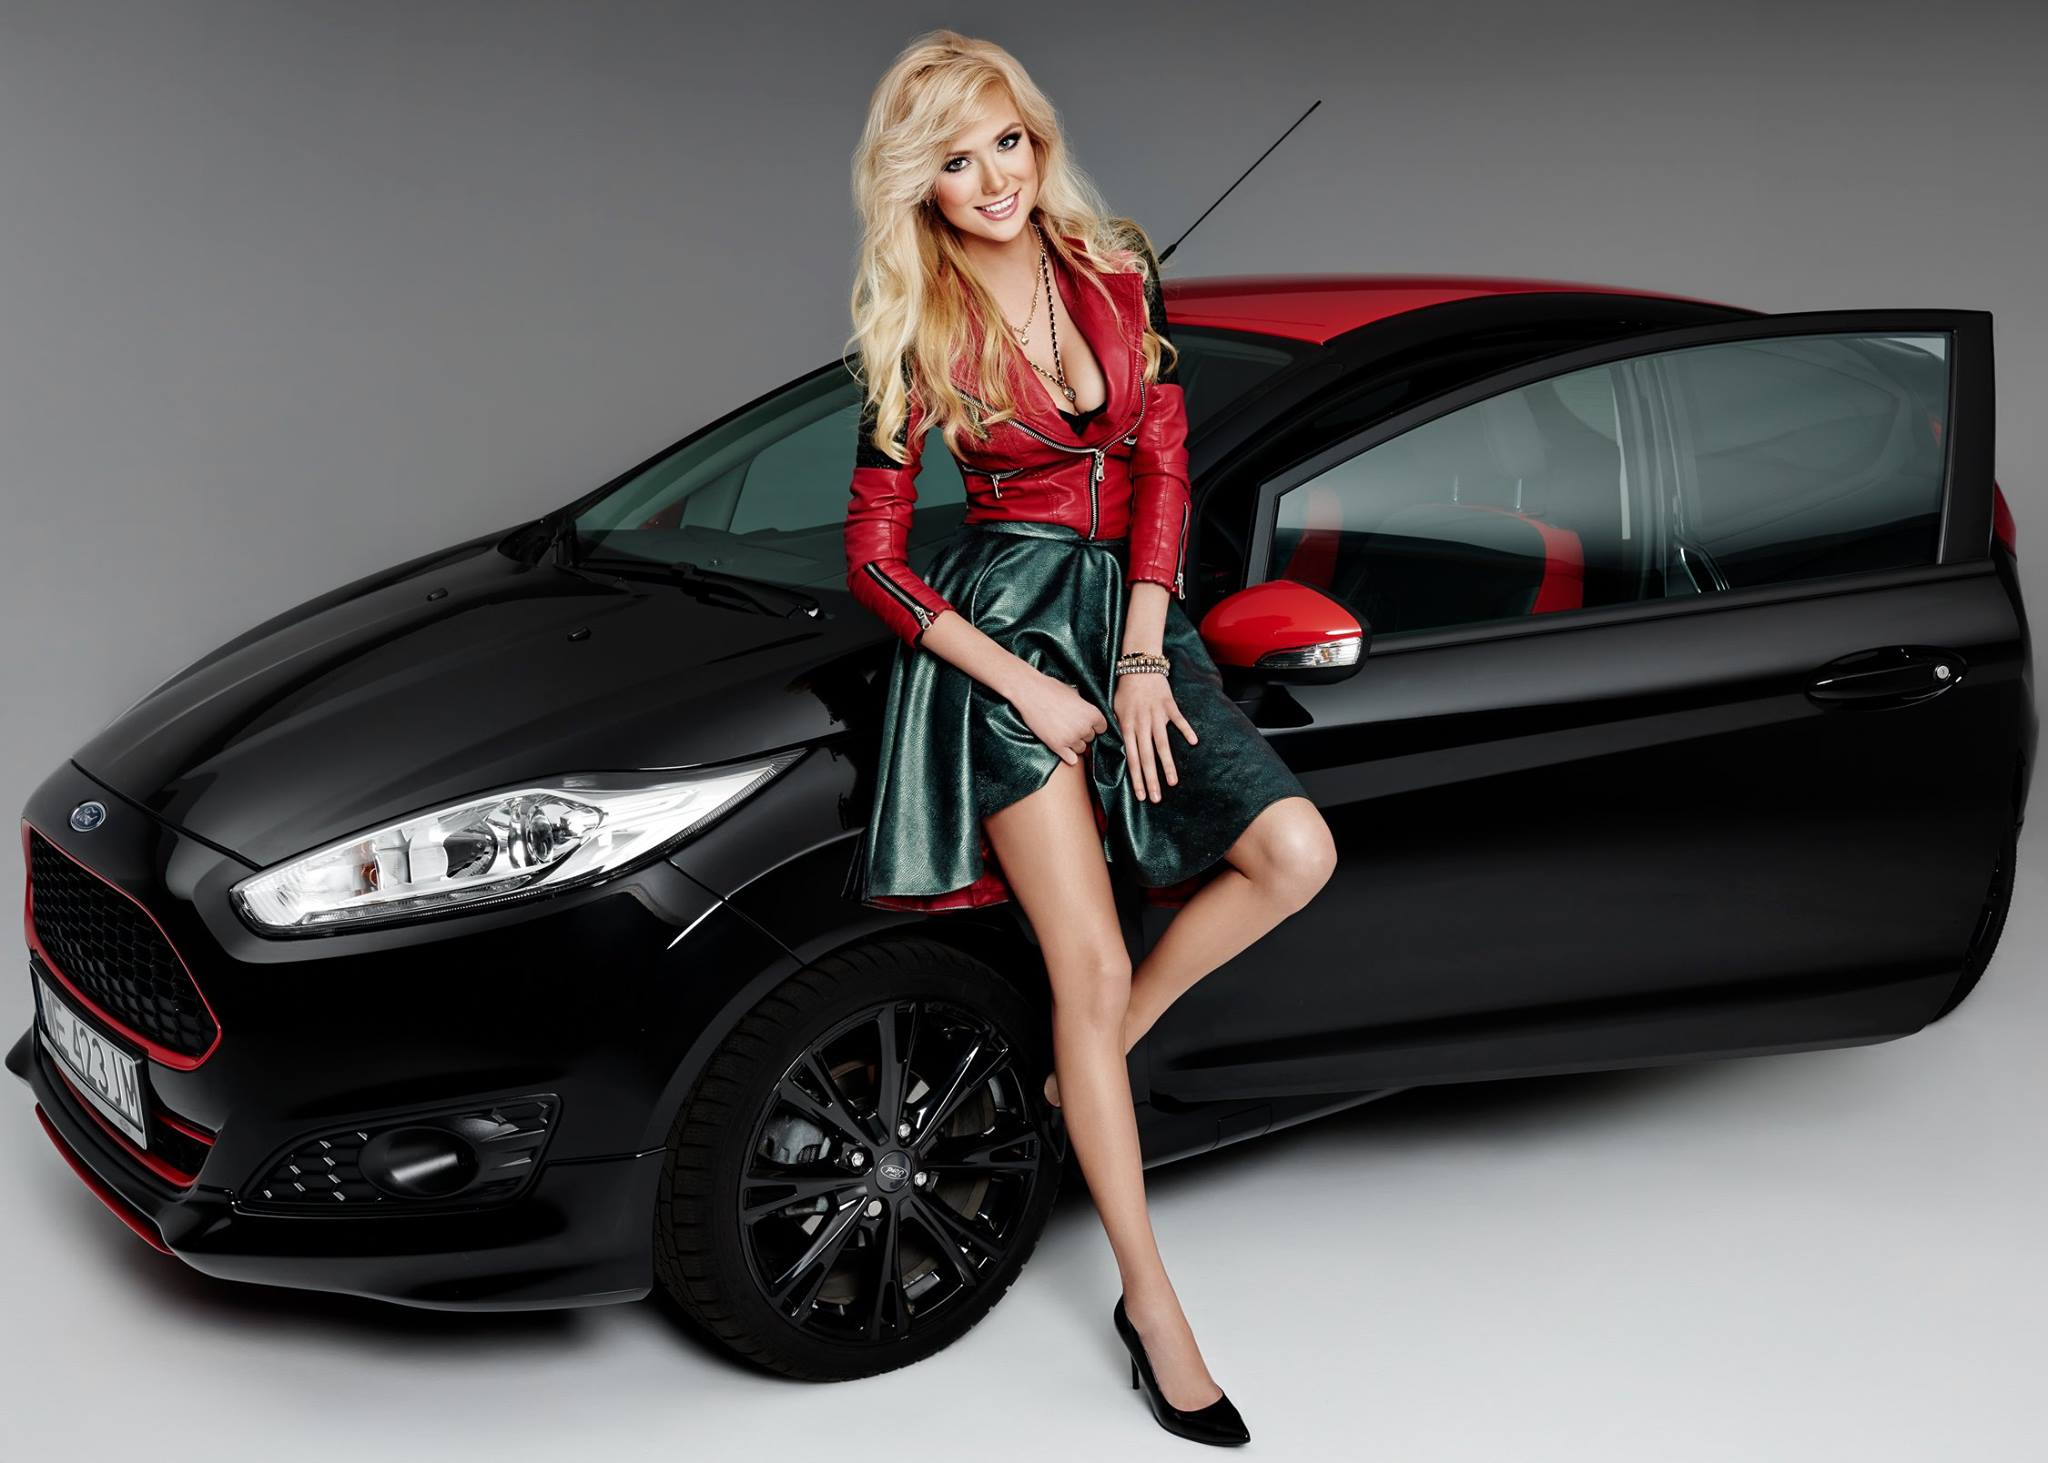 Ferrari Girl Wallpaper Polish Blonde Model Agata Makes A Ford Fiesta Black